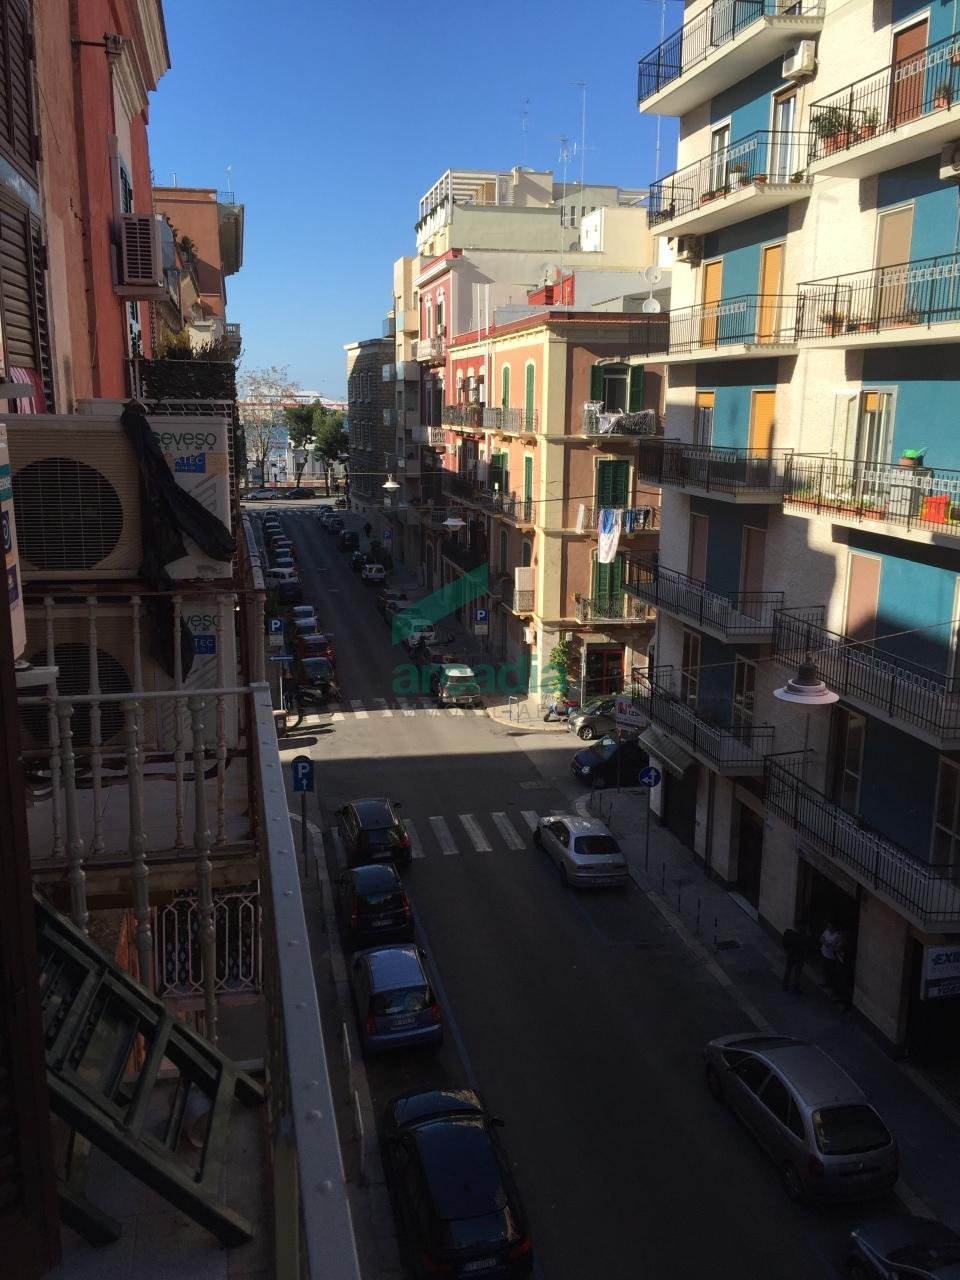 Bilocale Bari Via Bonazzi 36 1